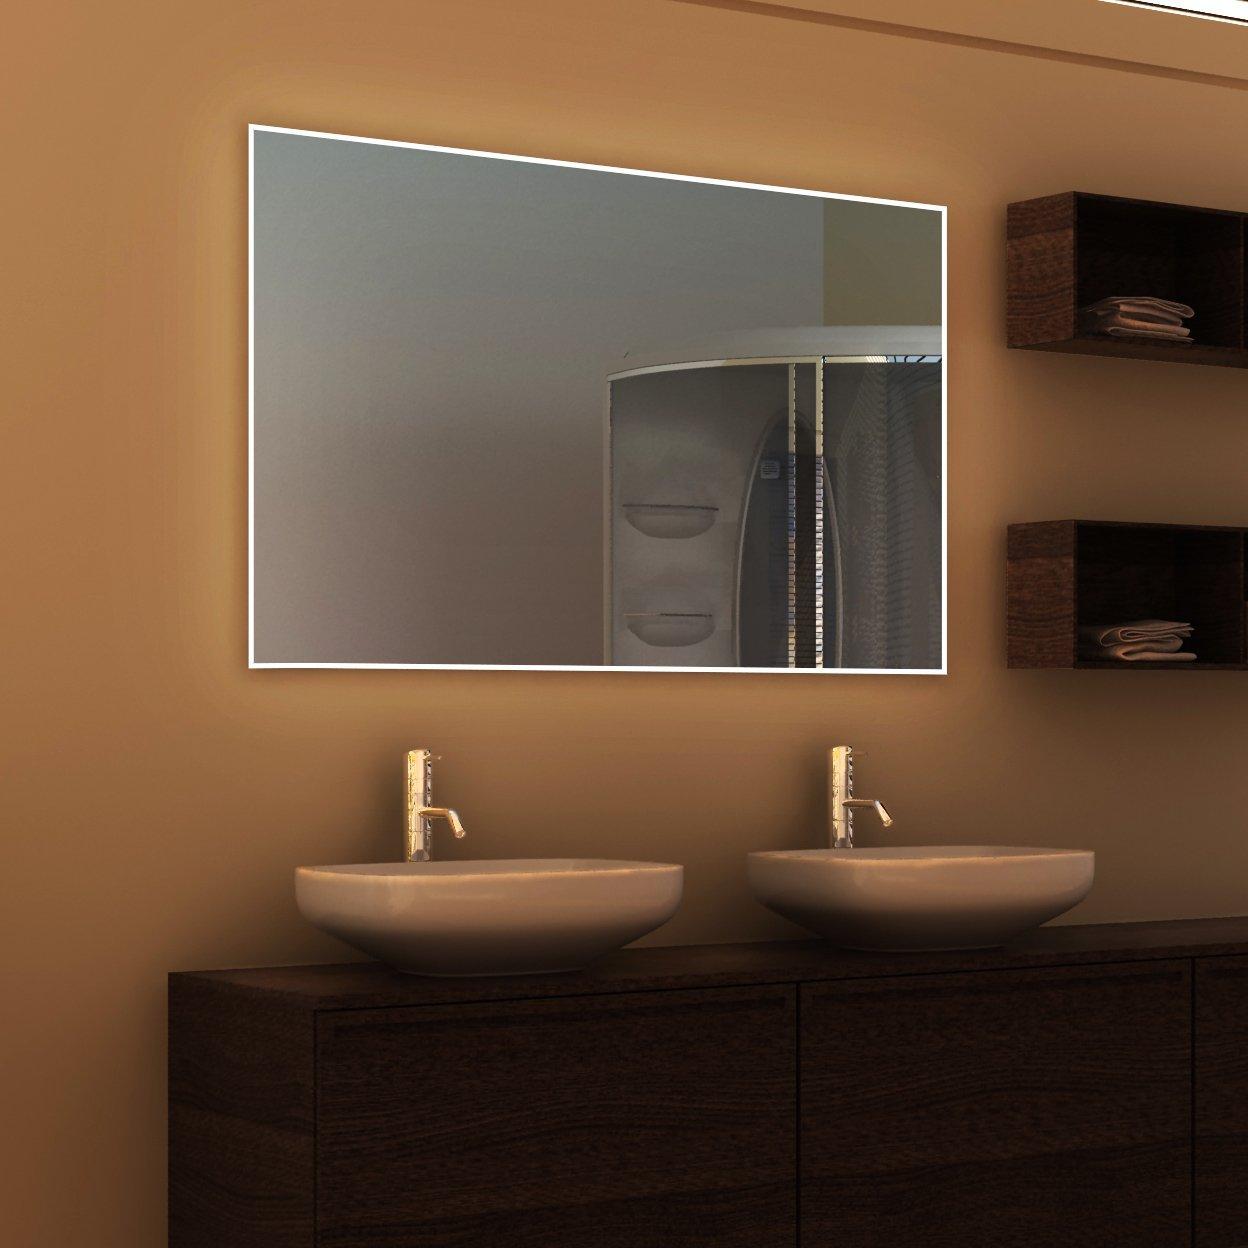 Siena Design - LED BADSPIEGEL mit Beleuchtung - Made in Germany ...